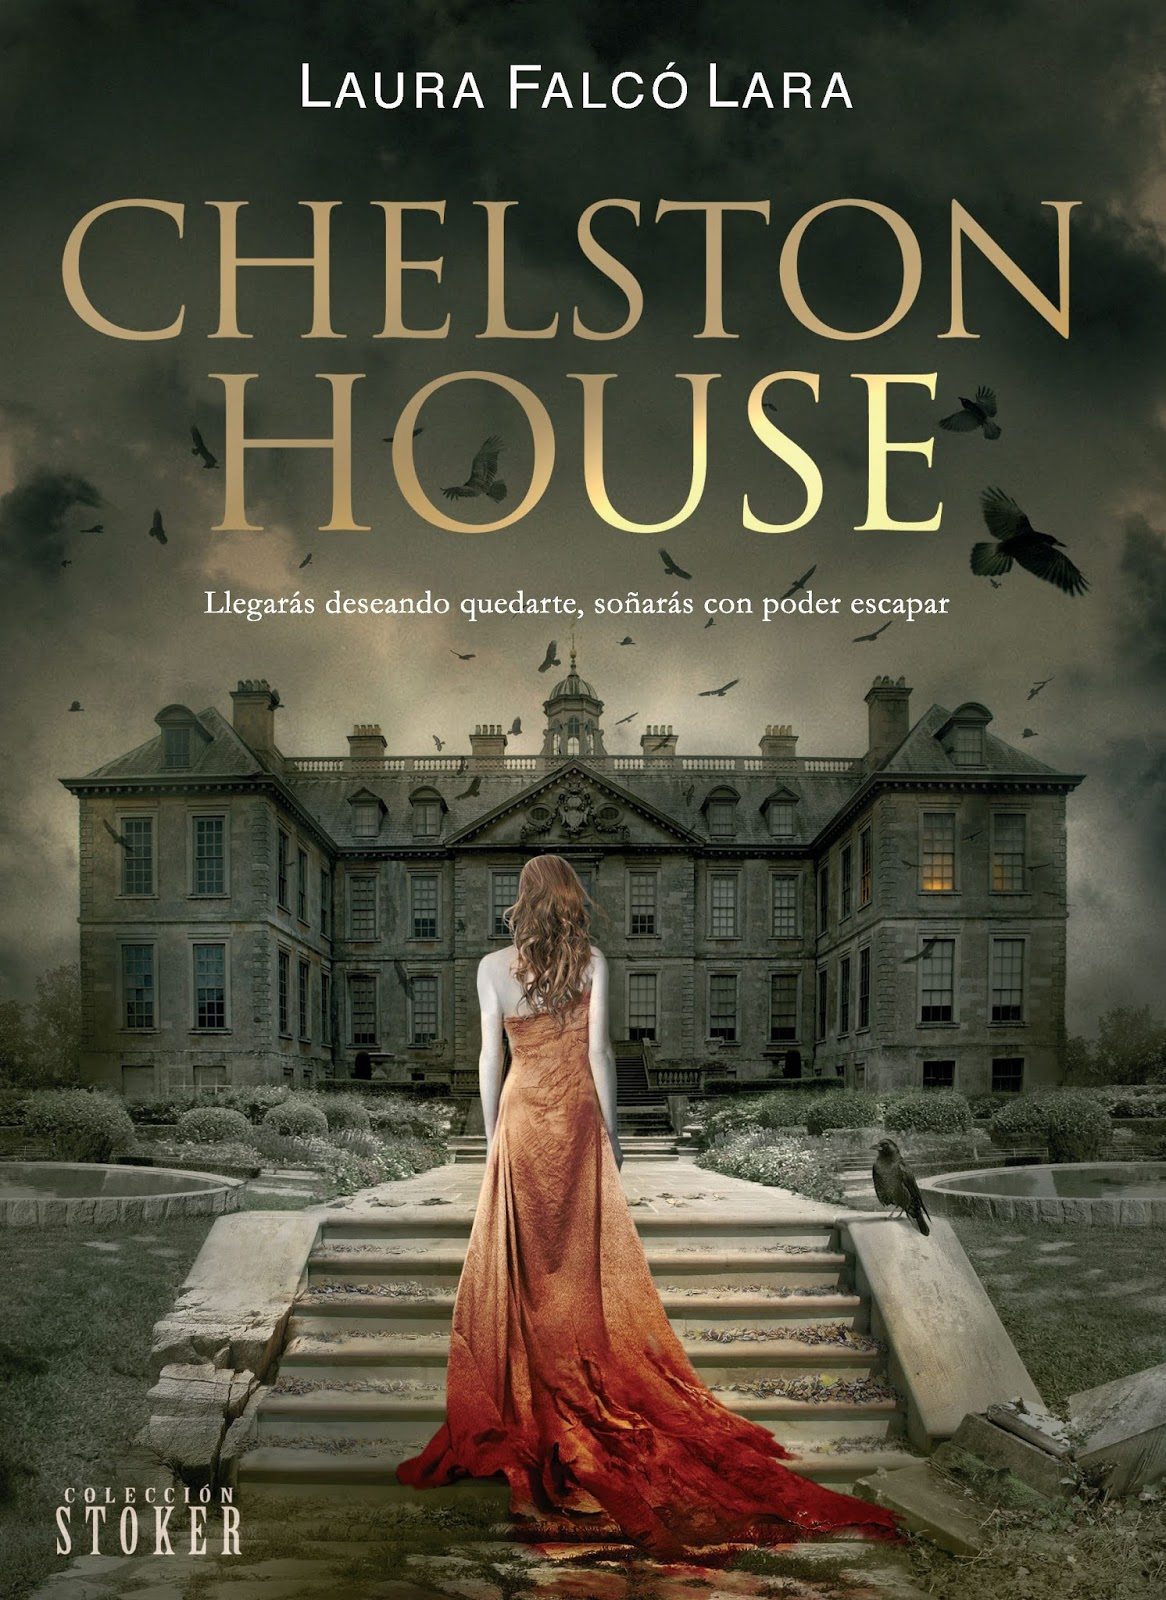 https://labibliotecadebella.blogspot.com/2018/07/resena-chelston-house-laura-falco-lara.html